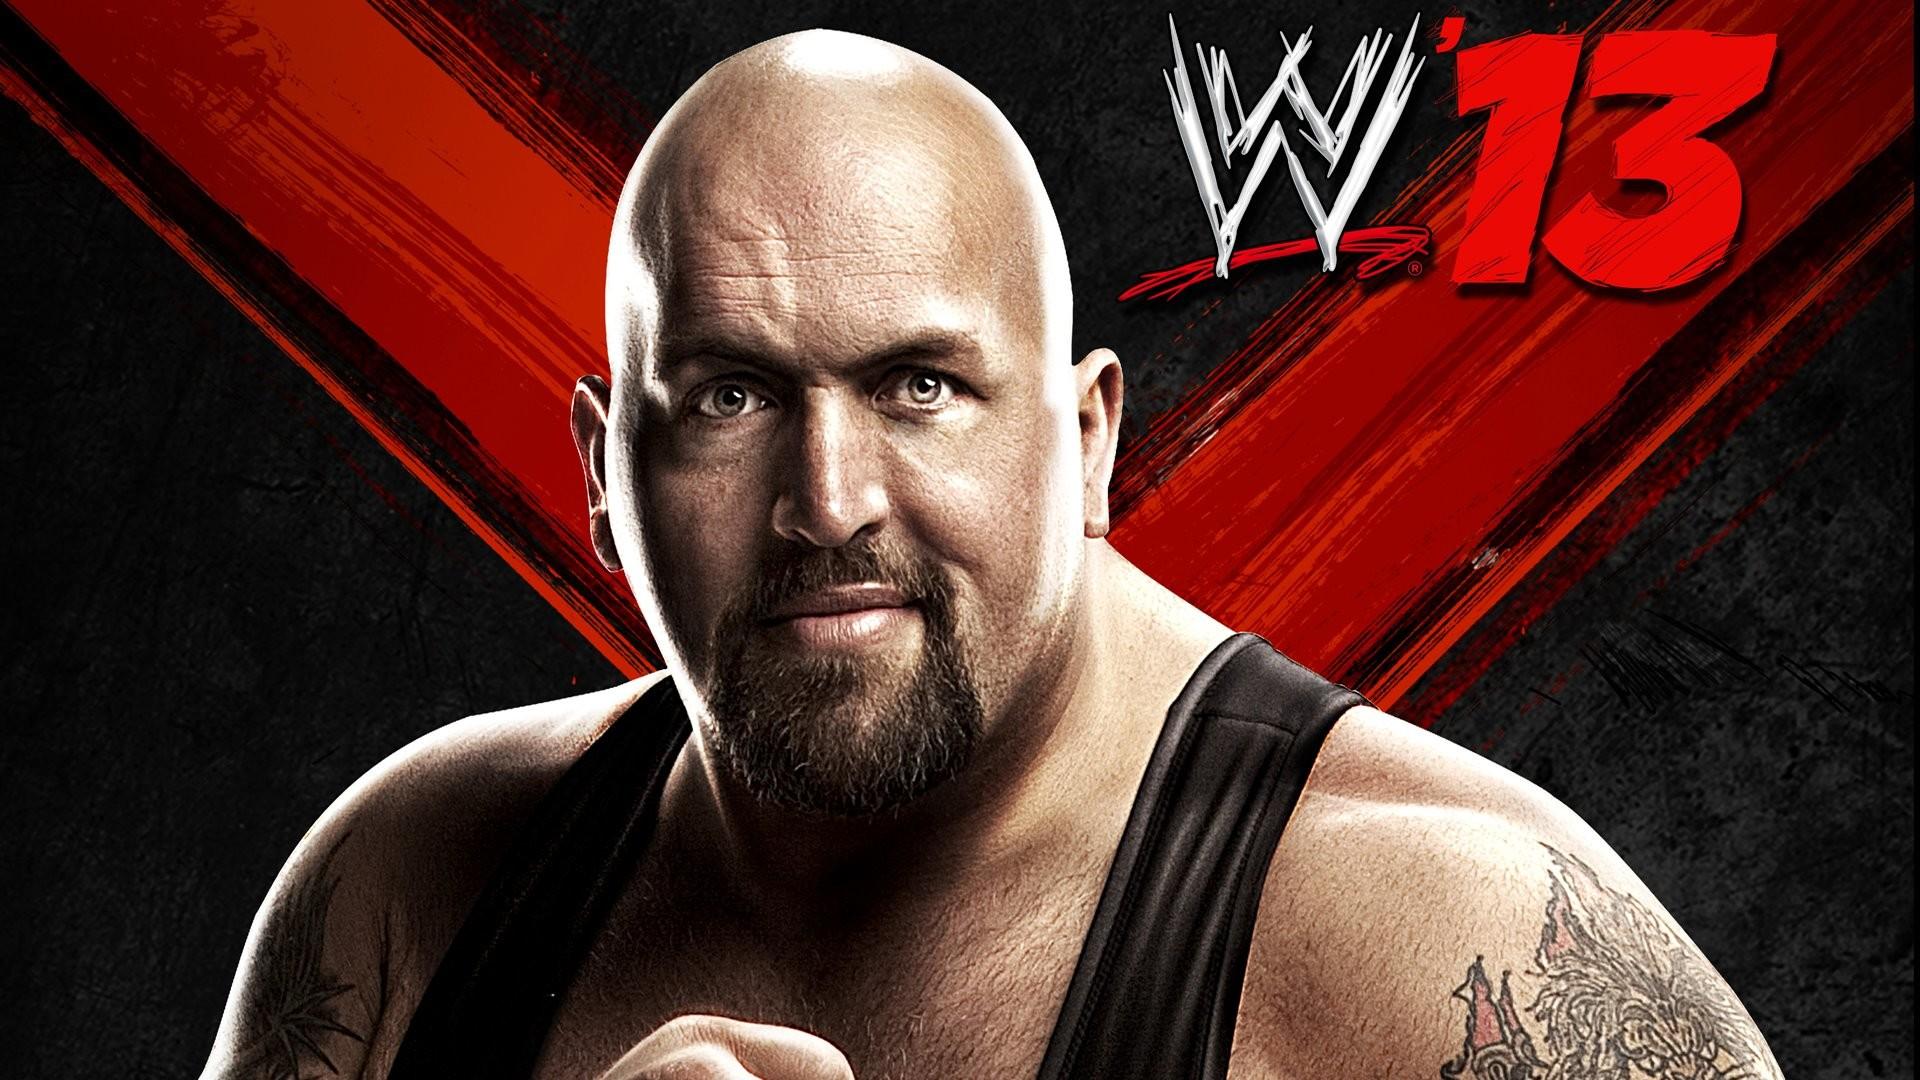 Res: 1920x1080, WWE '13 HD Wallpaper   Hintergrund      ID:269058 - Wallpaper Abyss